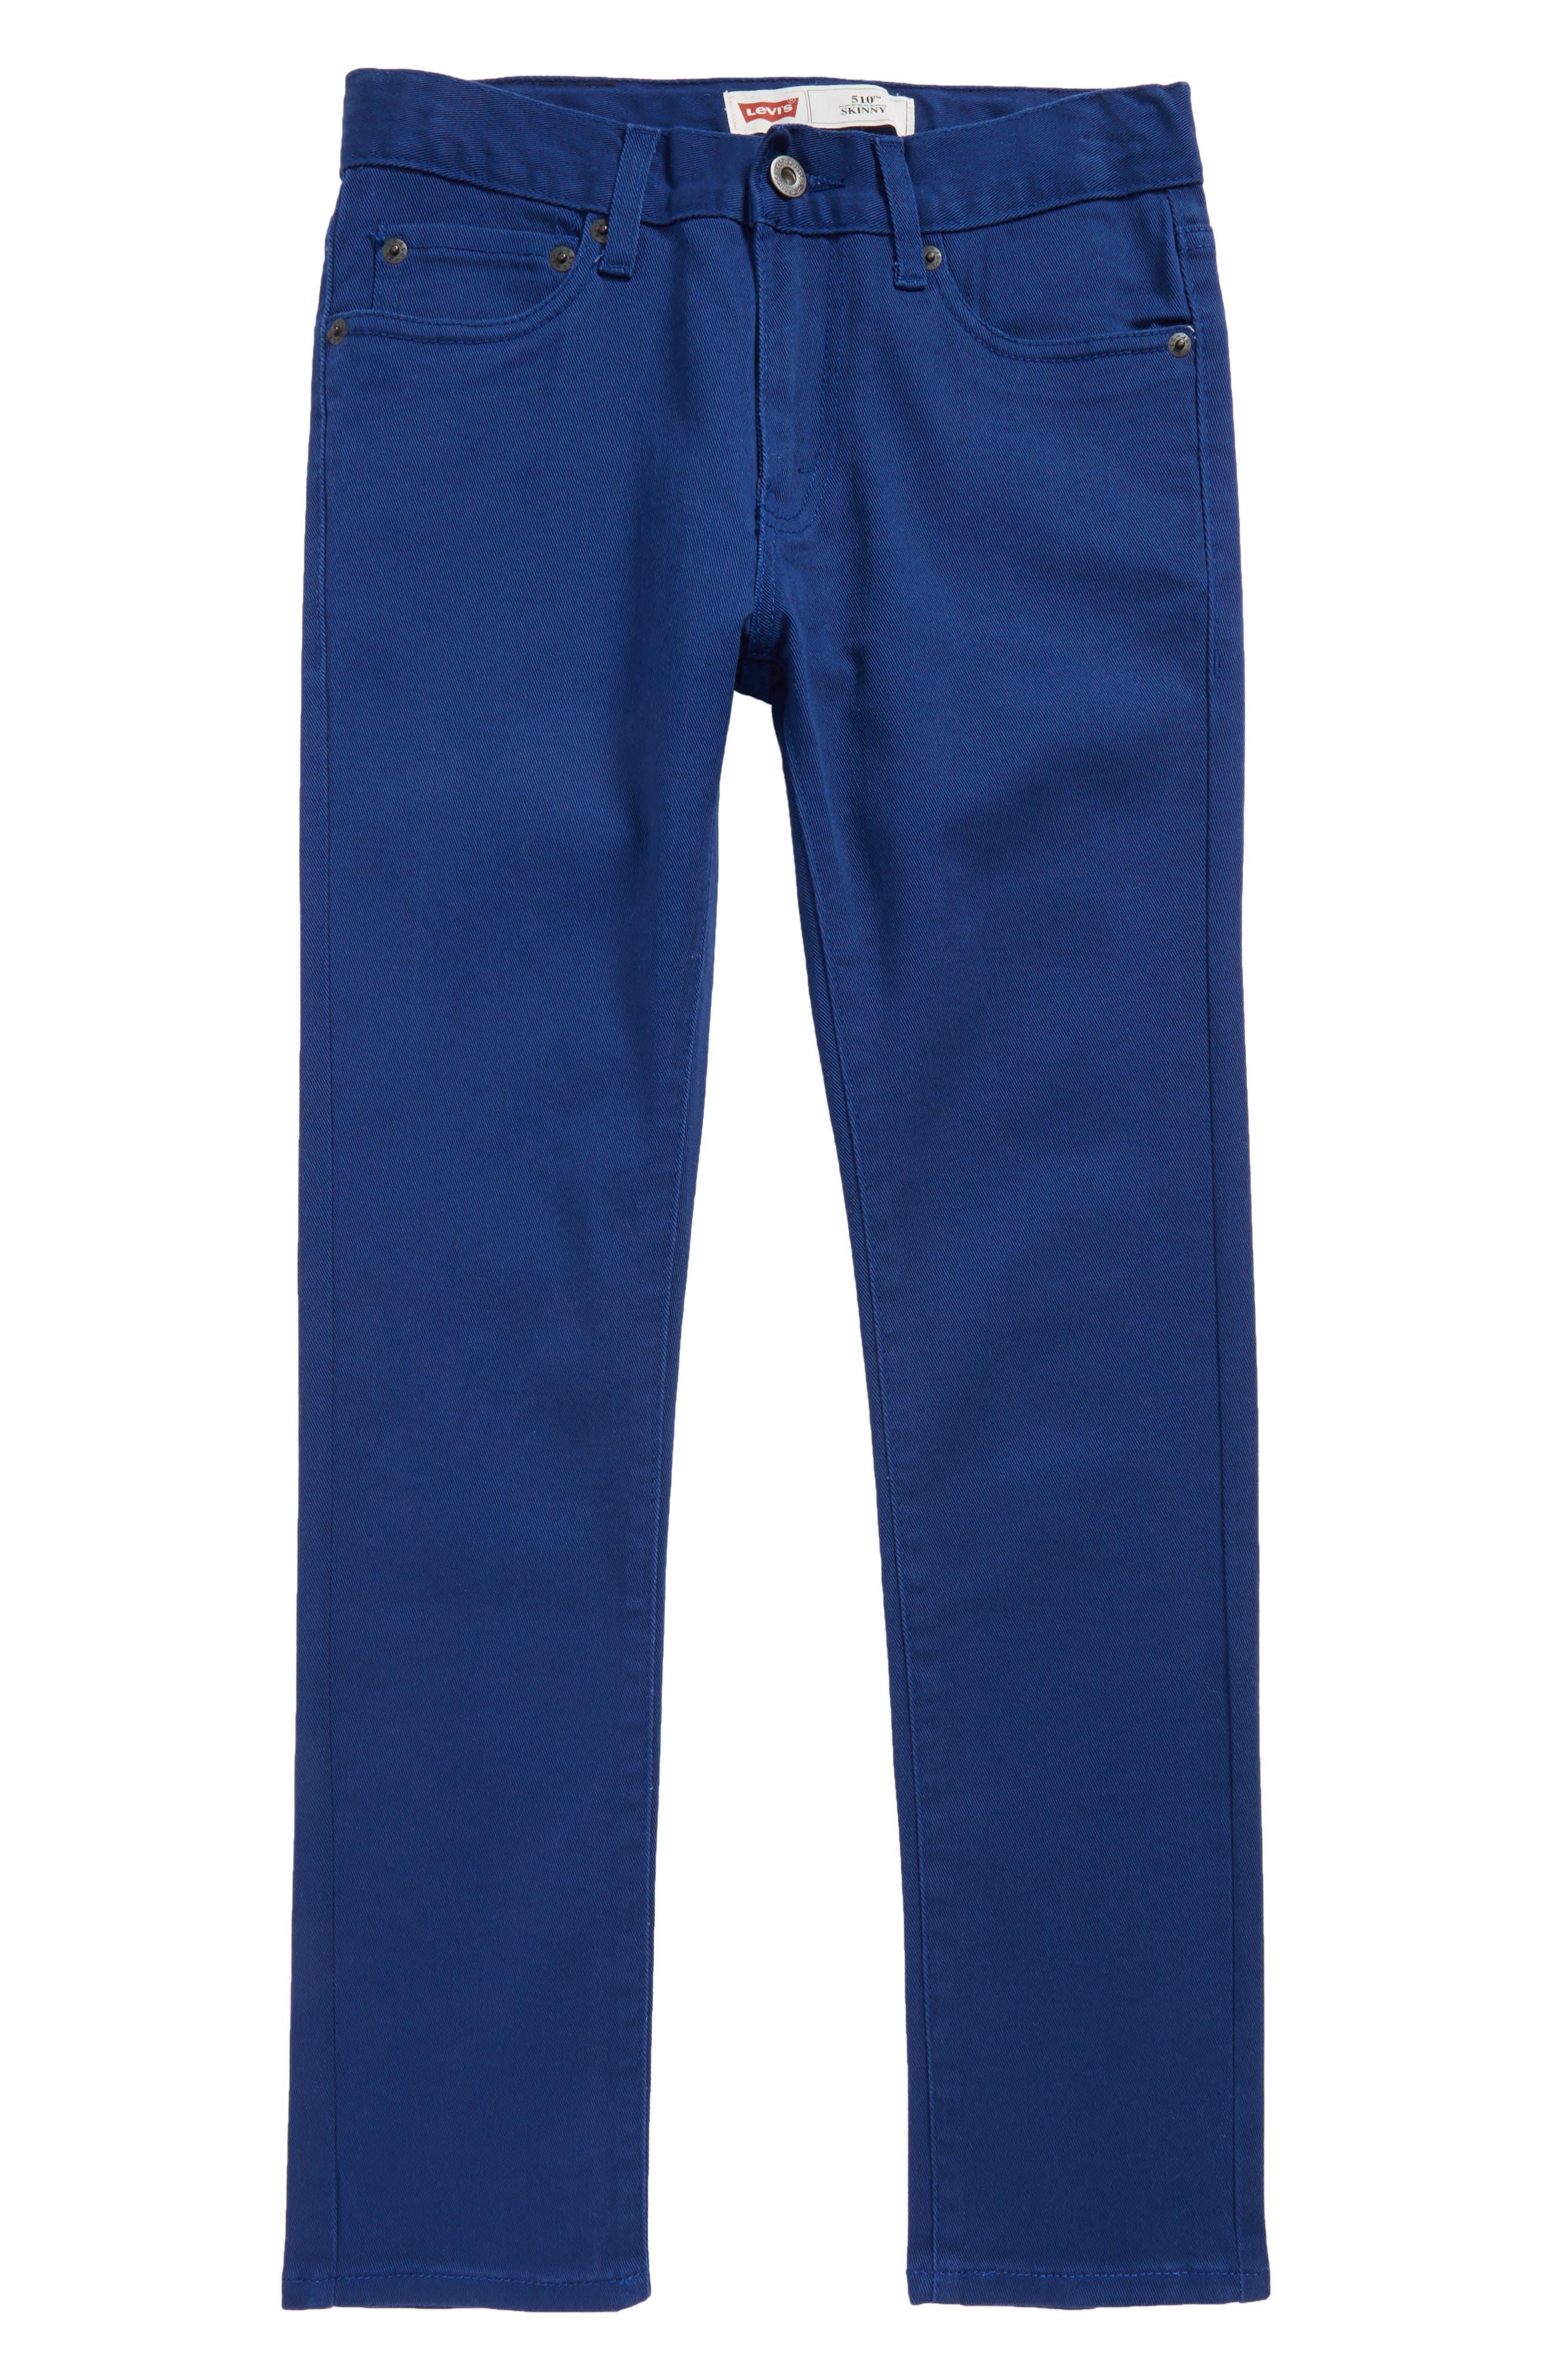 Alternate Image 1 Selected - Levi's® 510™ Skinny Fit Jeans (Toddler Boys, Little Boys & Big Boys)